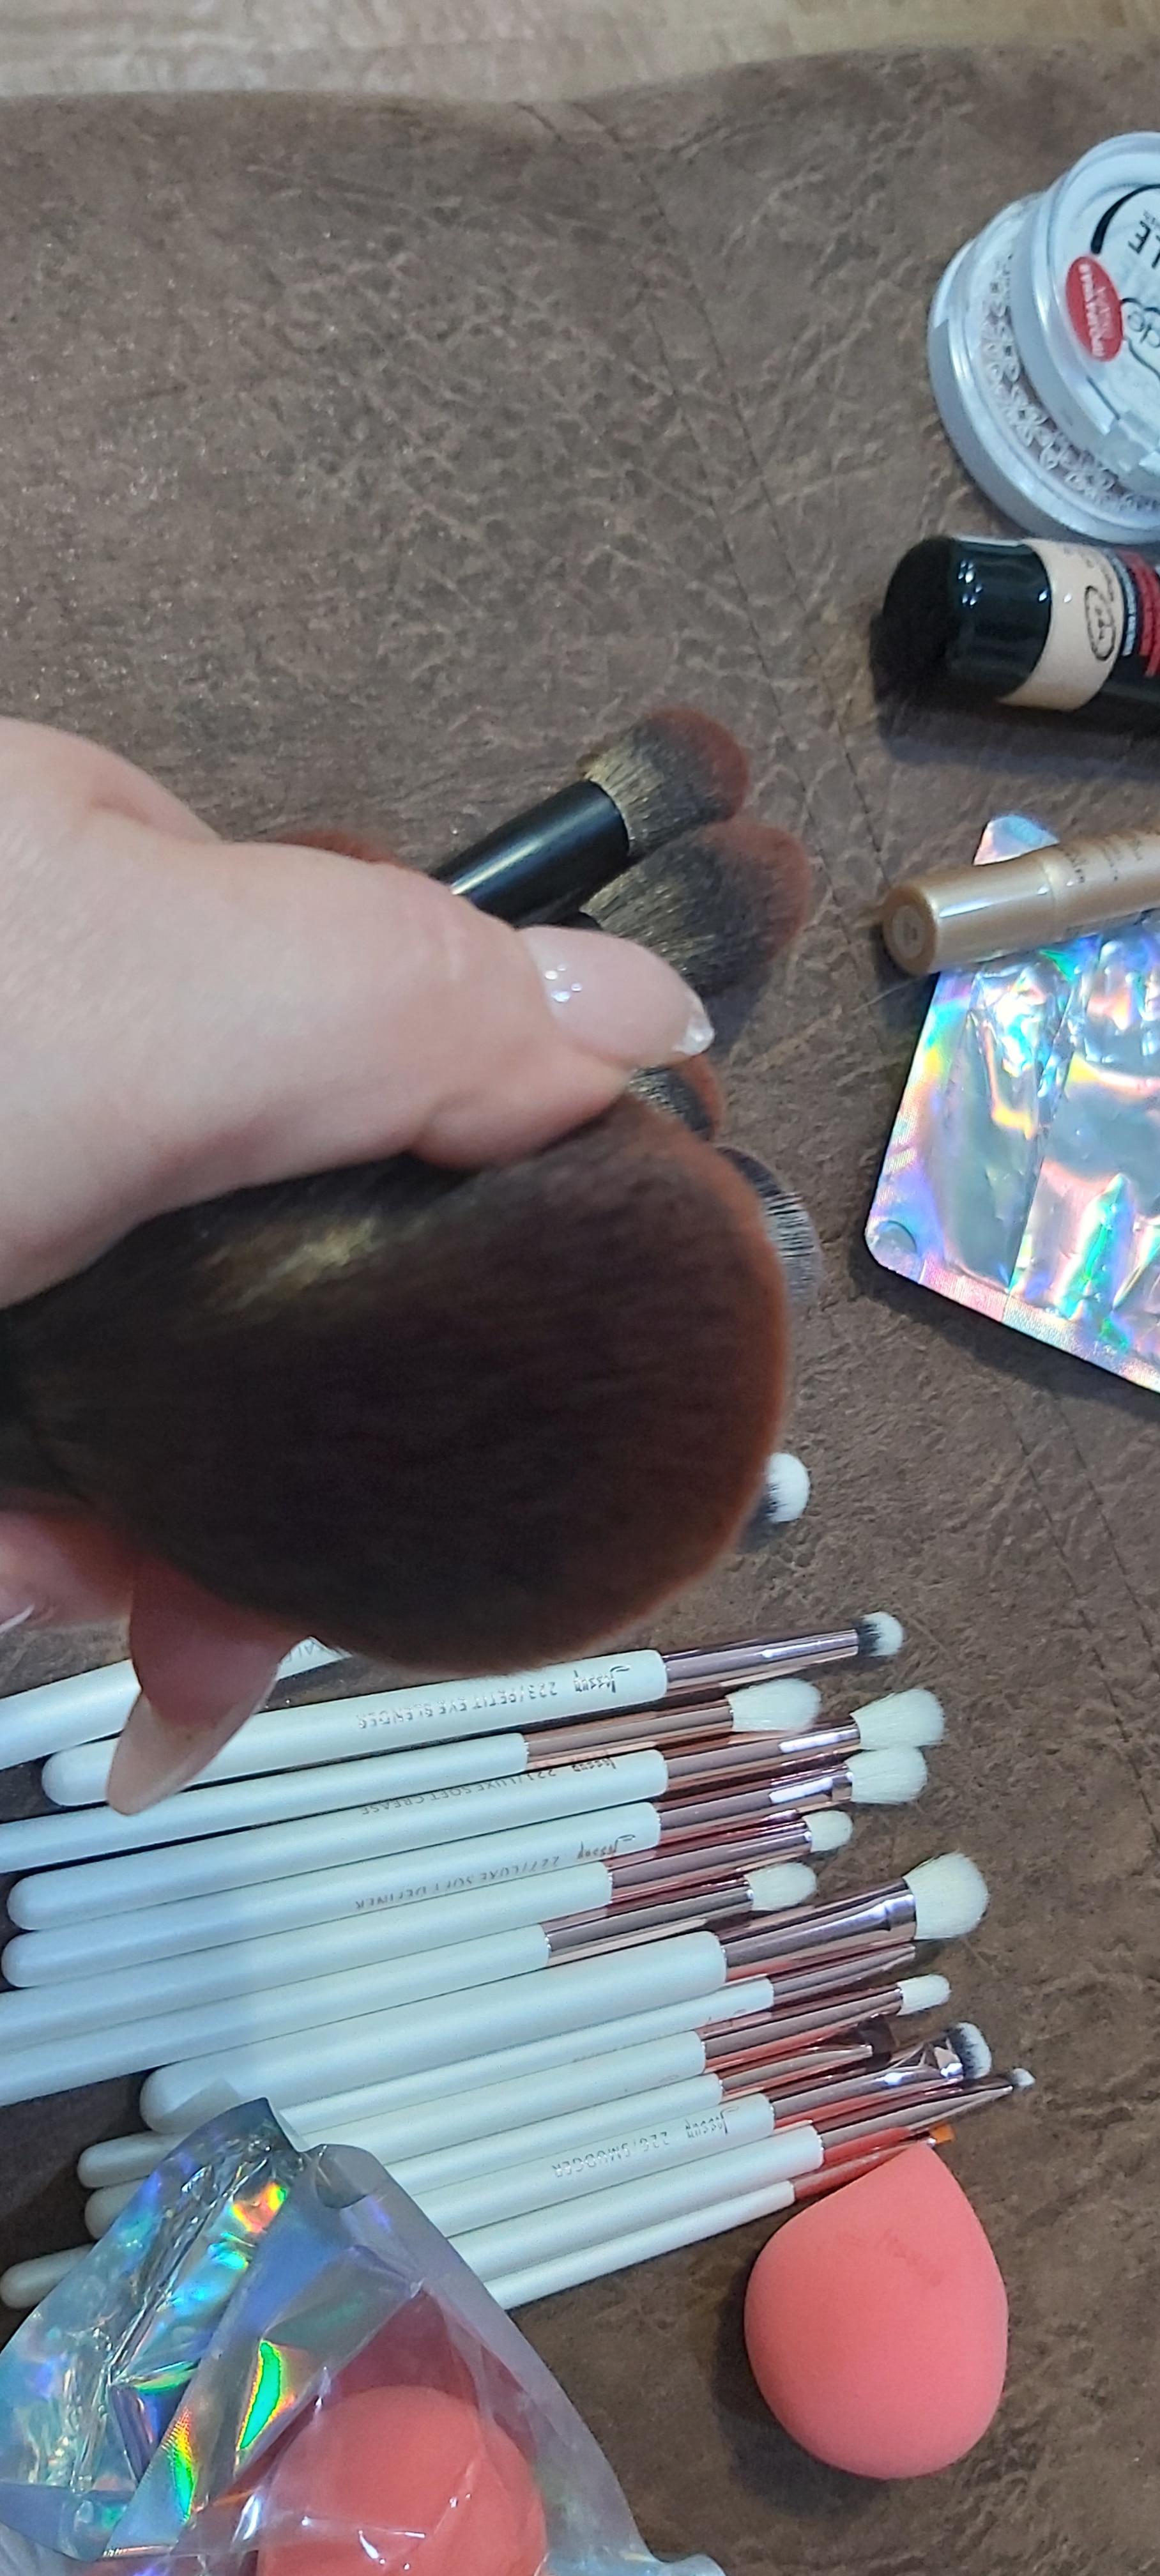 Jessup New Arrival Makeup brushes brushes Phantom Black 3-21pcs Foundation brush Powder Concealer Eyeshadow Synthetic hair reviews №3 177768